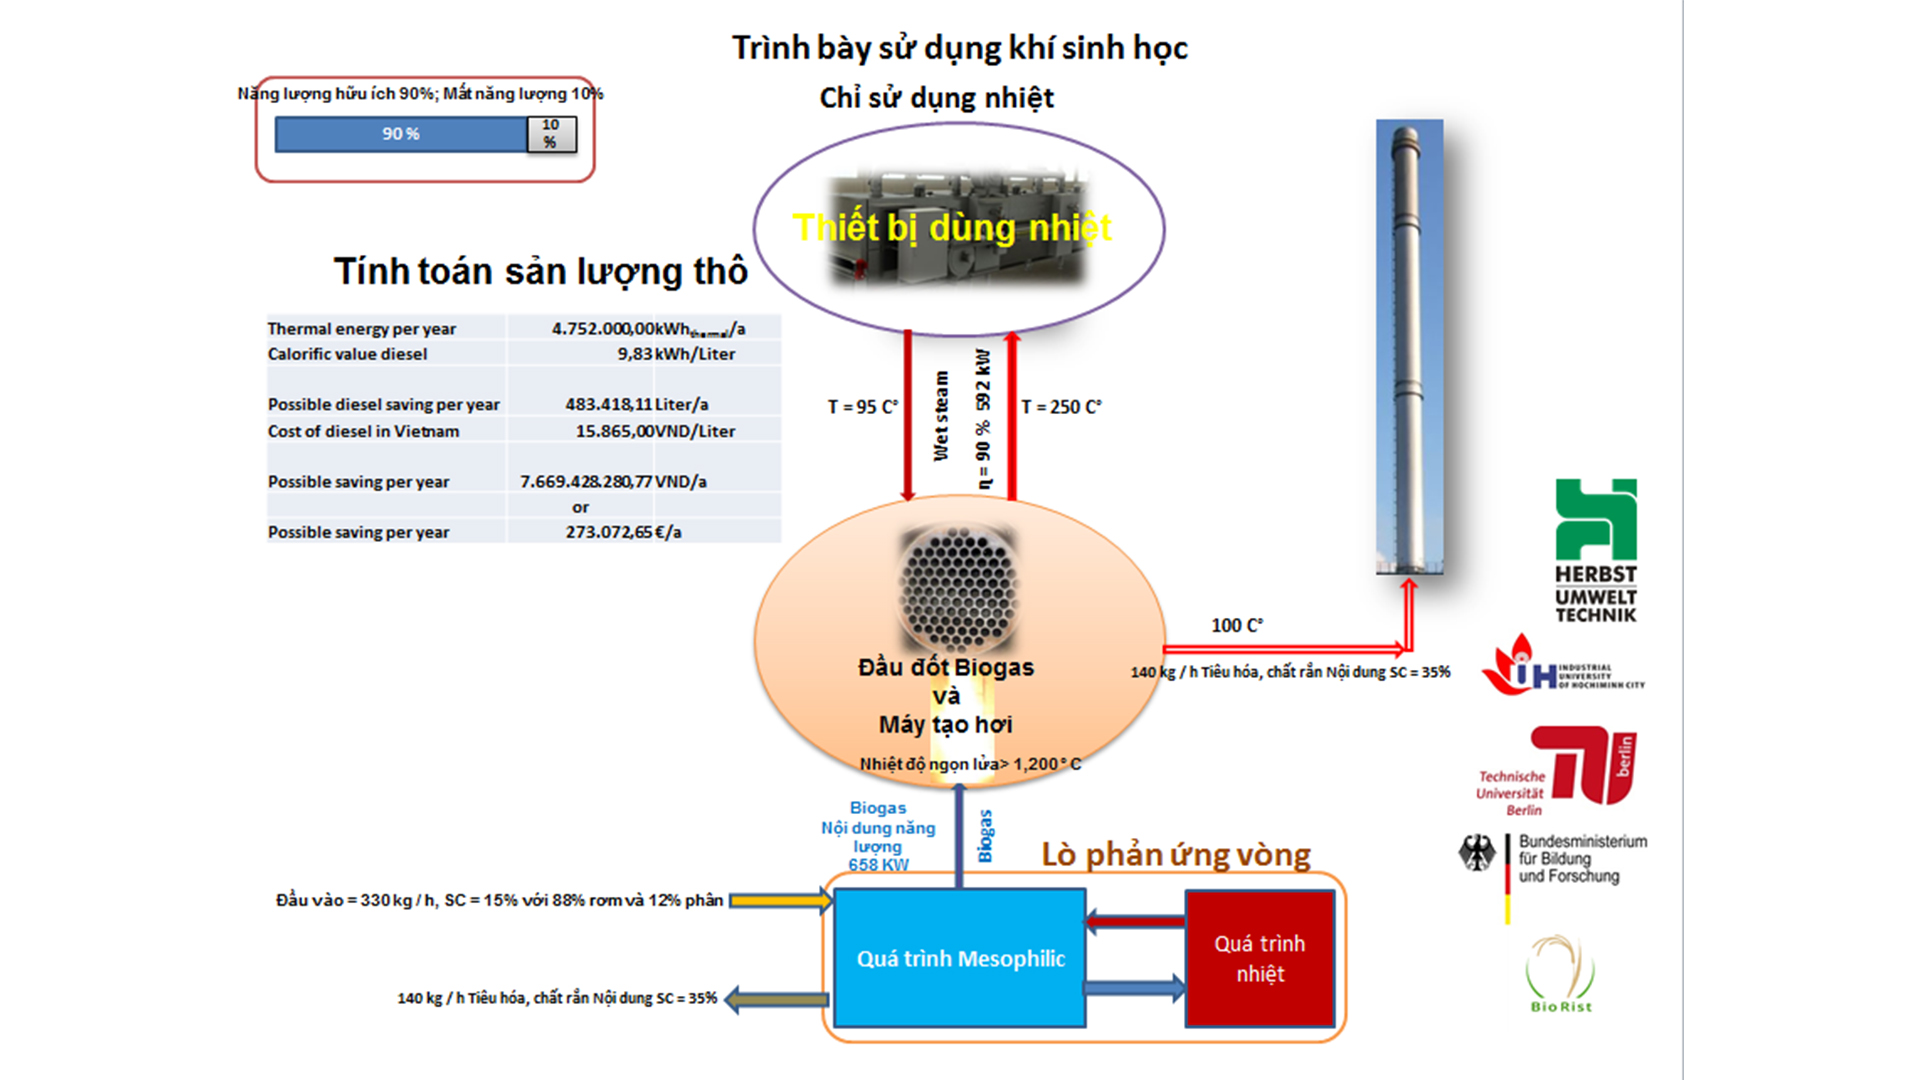 su-dung-khi-sinh-hoc-chi-su-dung-nhiet-tu-cong-nghe-biogas-hien-dai-tao-nhiet